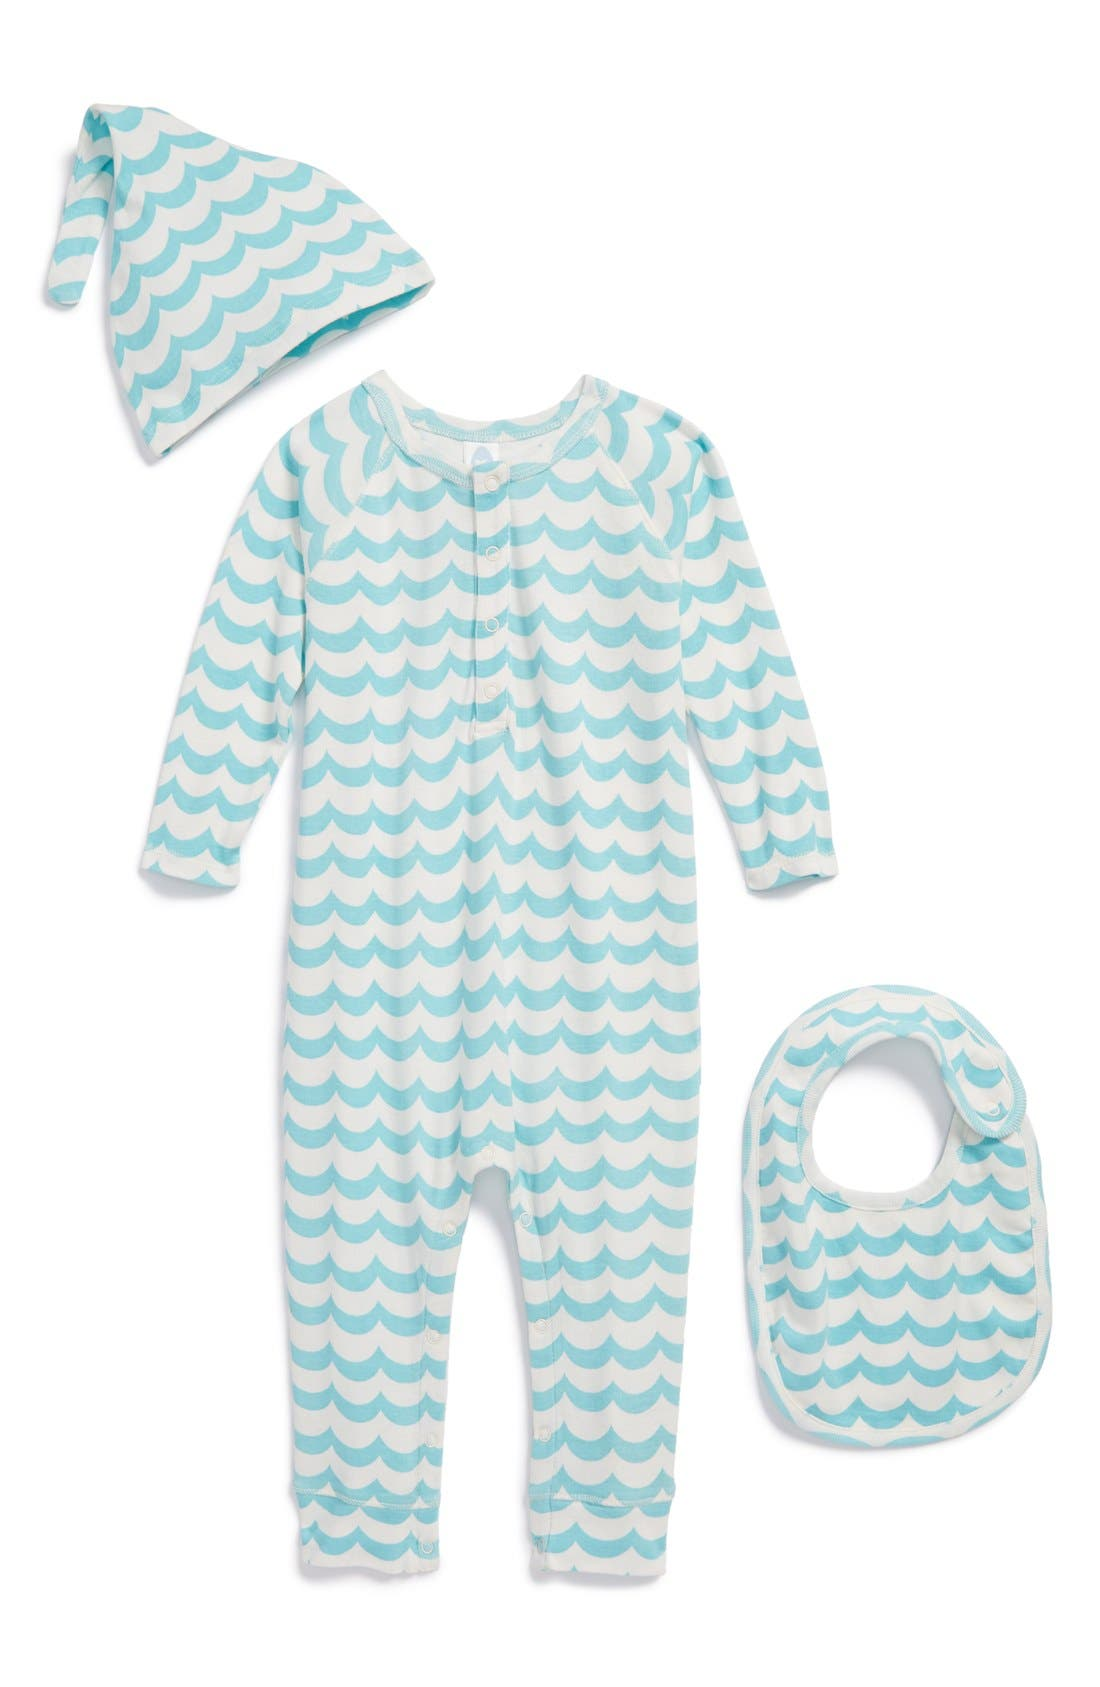 Main Image - Stem Baby Organic Cotton Romper, Cap & Bib (Baby Boys)